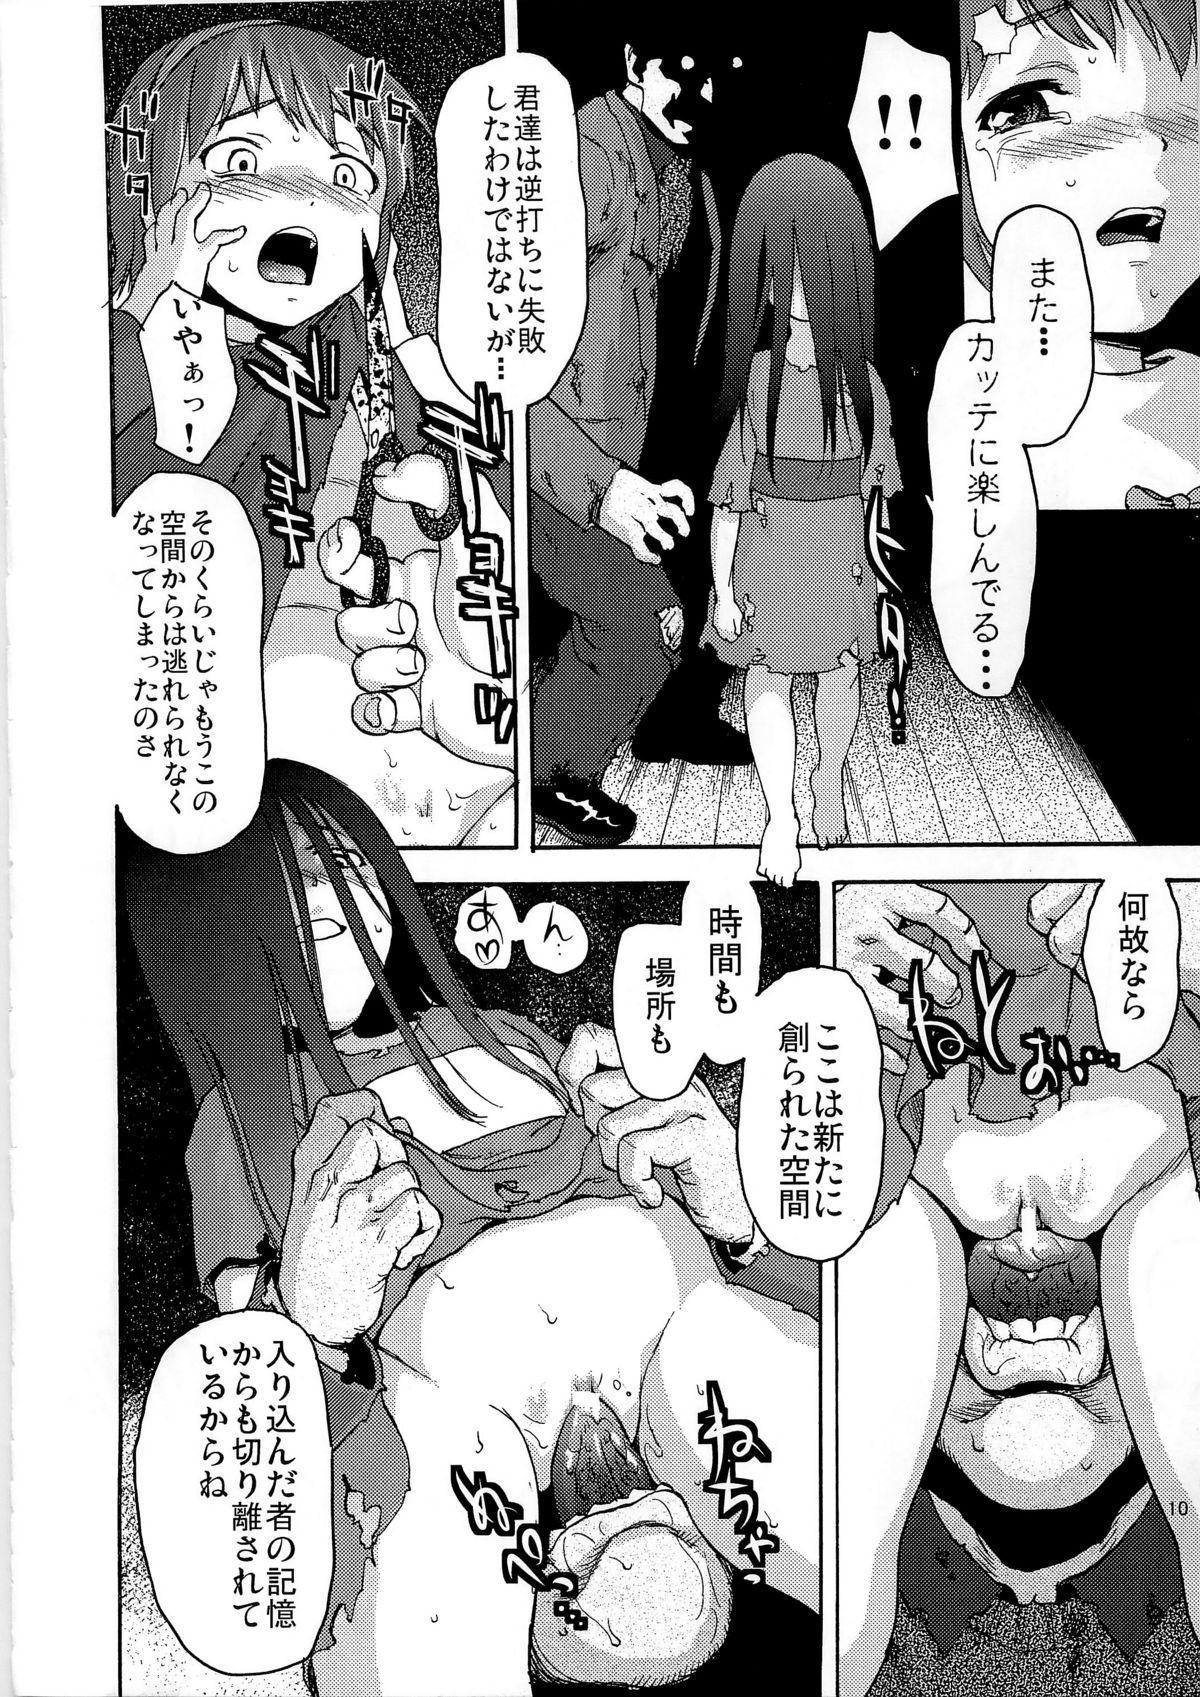 Ura EX chapter 9